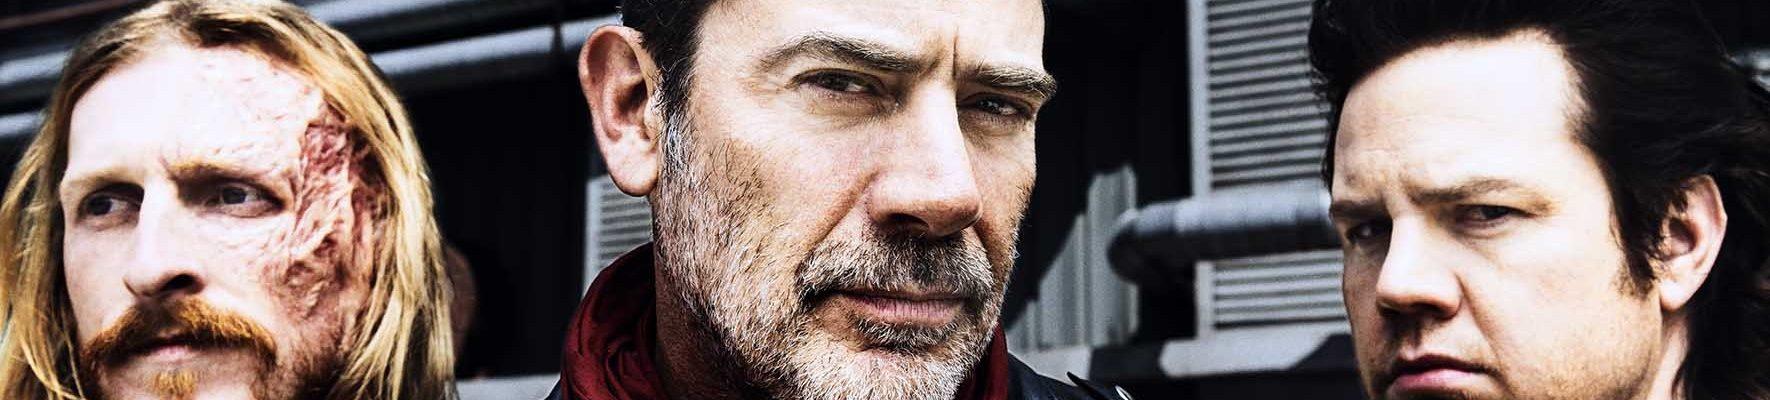 Walking Dead Πρεμιέρα 8ου Κύκλου Στο Fox